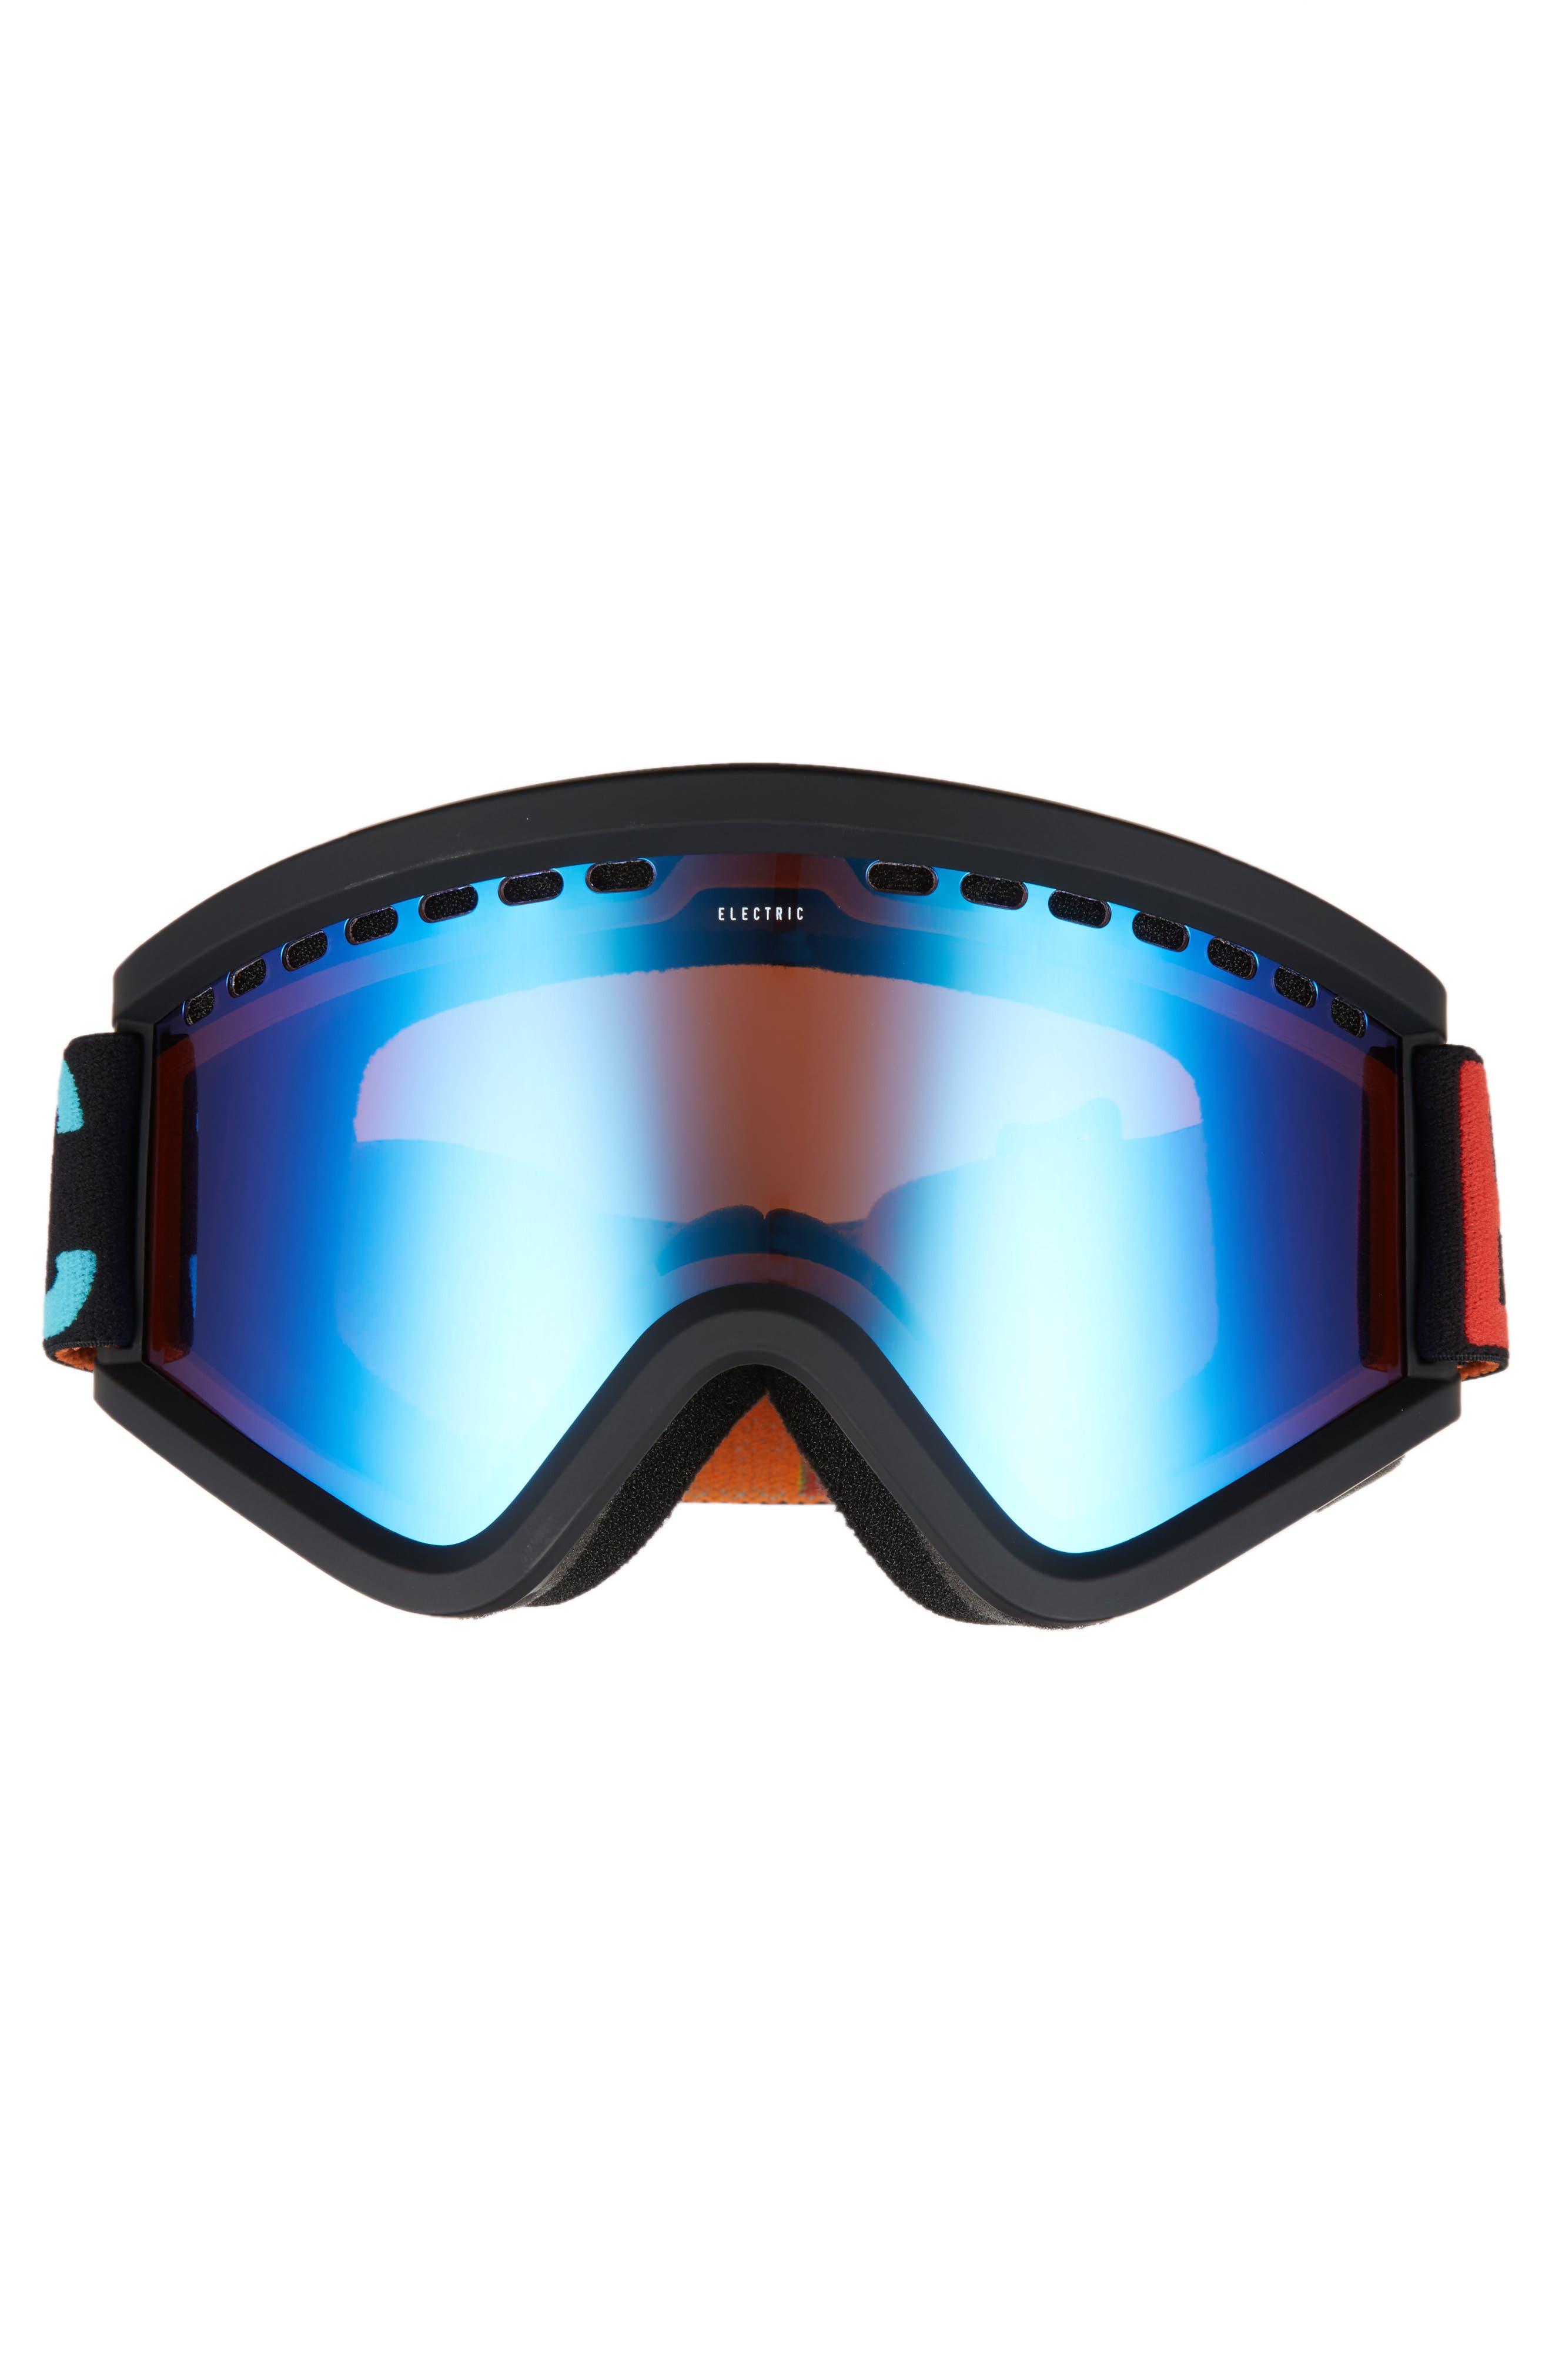 EGV Snow Goggles,                             Alternate thumbnail 12, color,